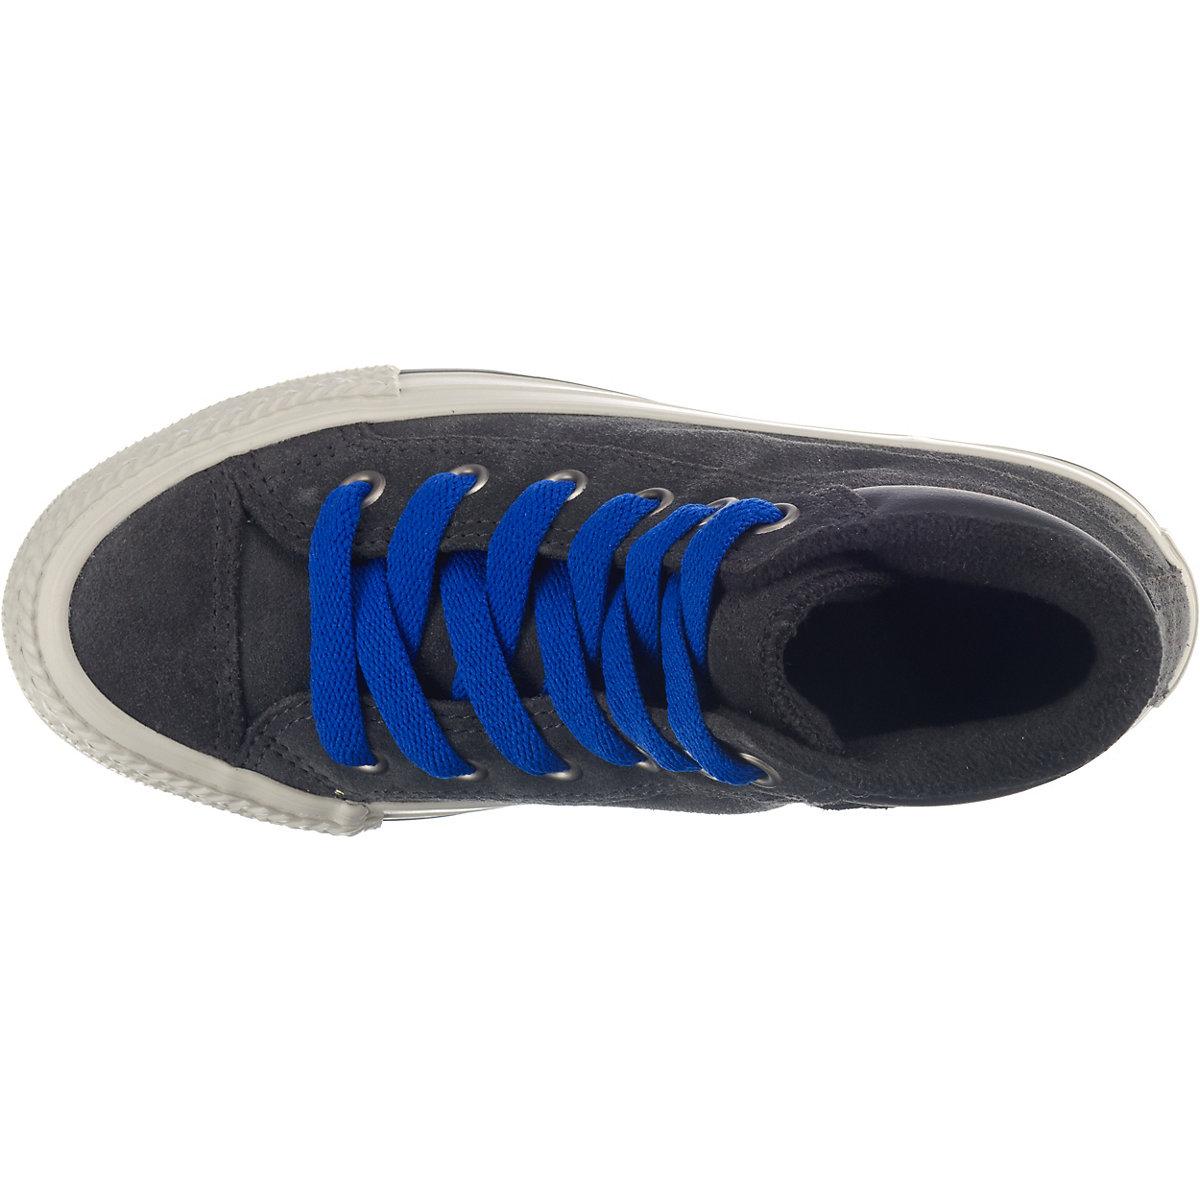 Converse, Sneakers High Ctas Pc Boot Hi Für Jungen, Grau